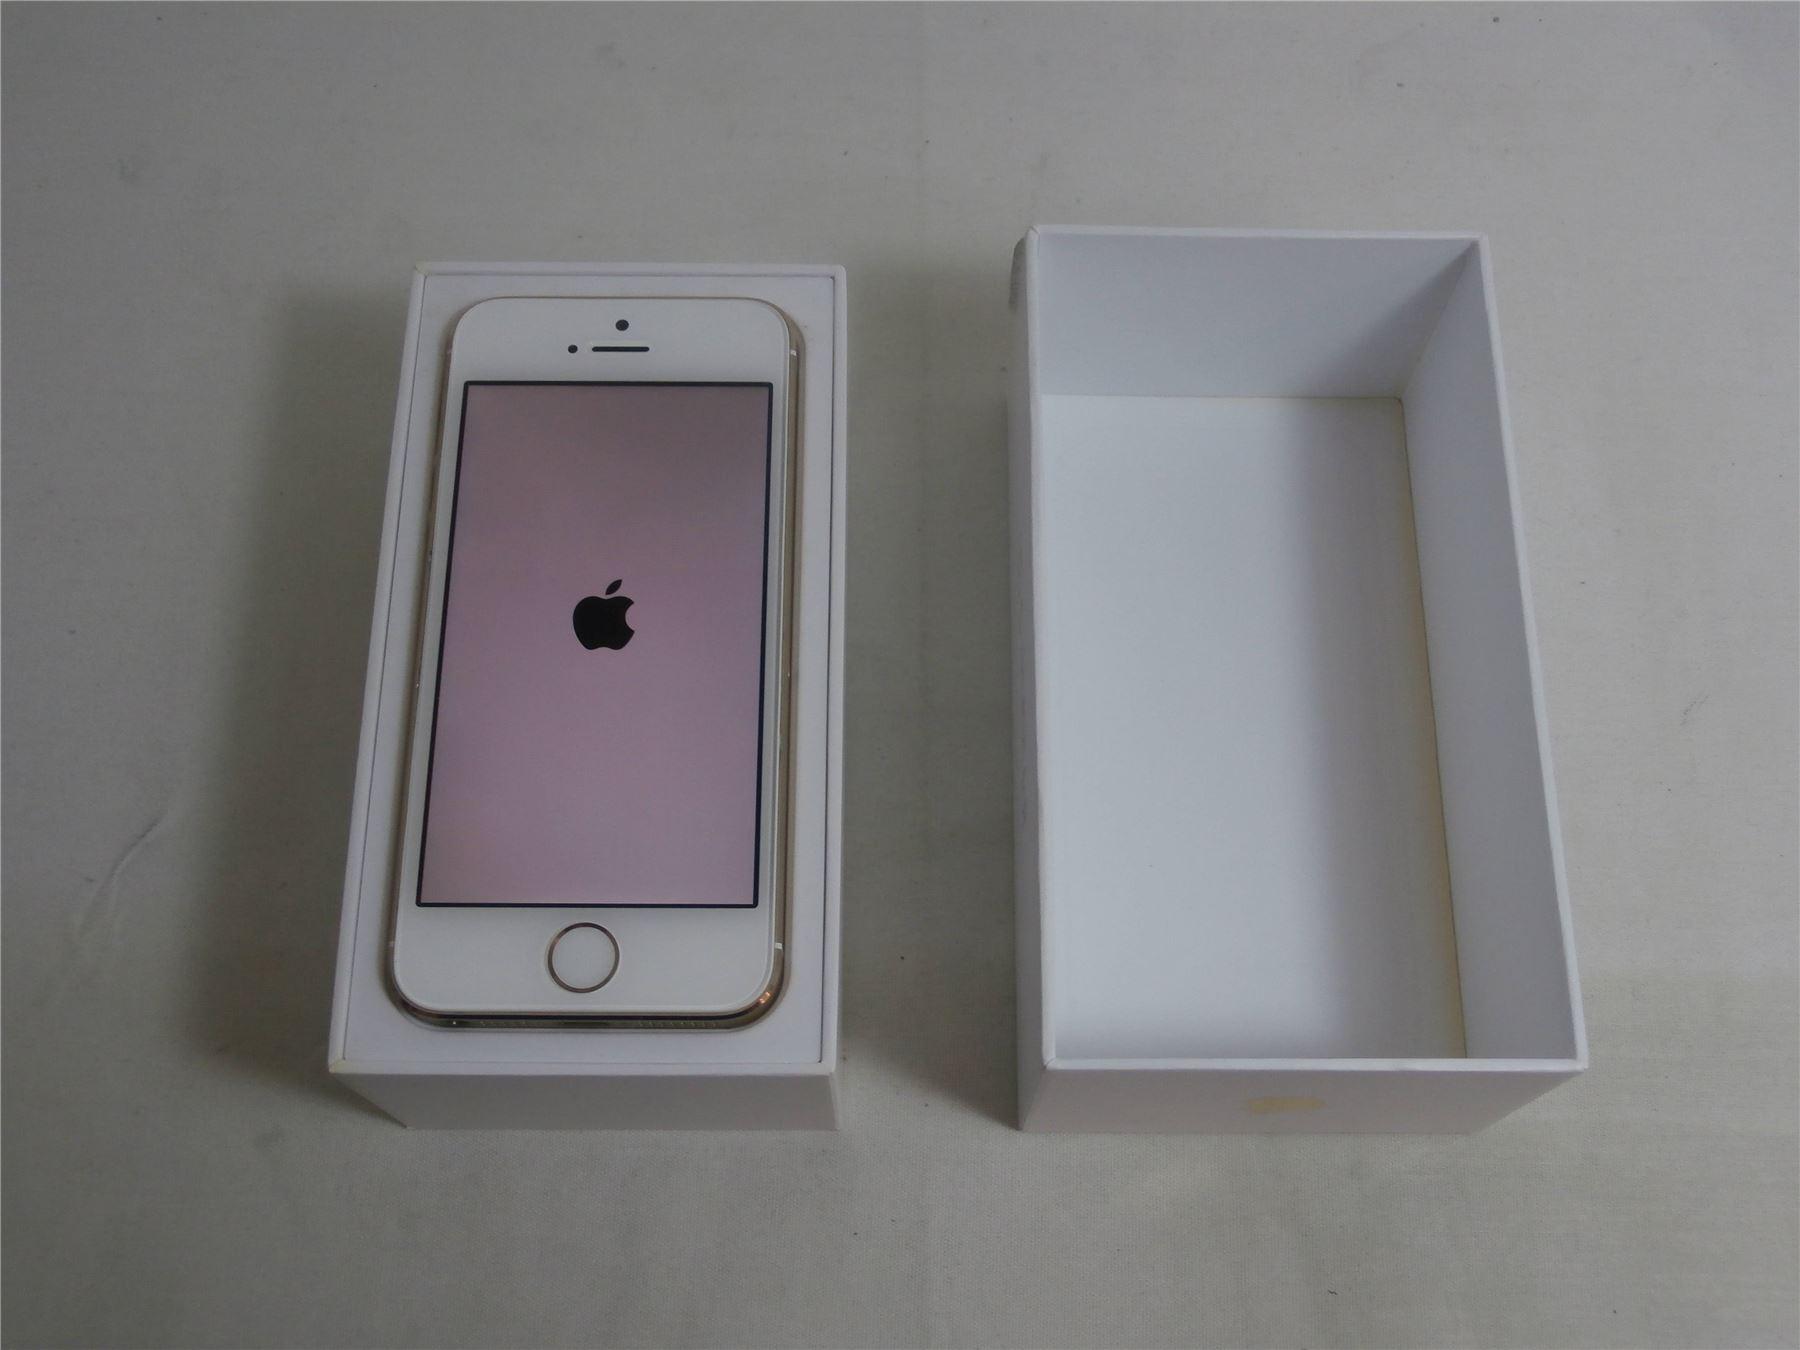 apple iphone 5s 16gb 4g white gold a1457 ebay. Black Bedroom Furniture Sets. Home Design Ideas